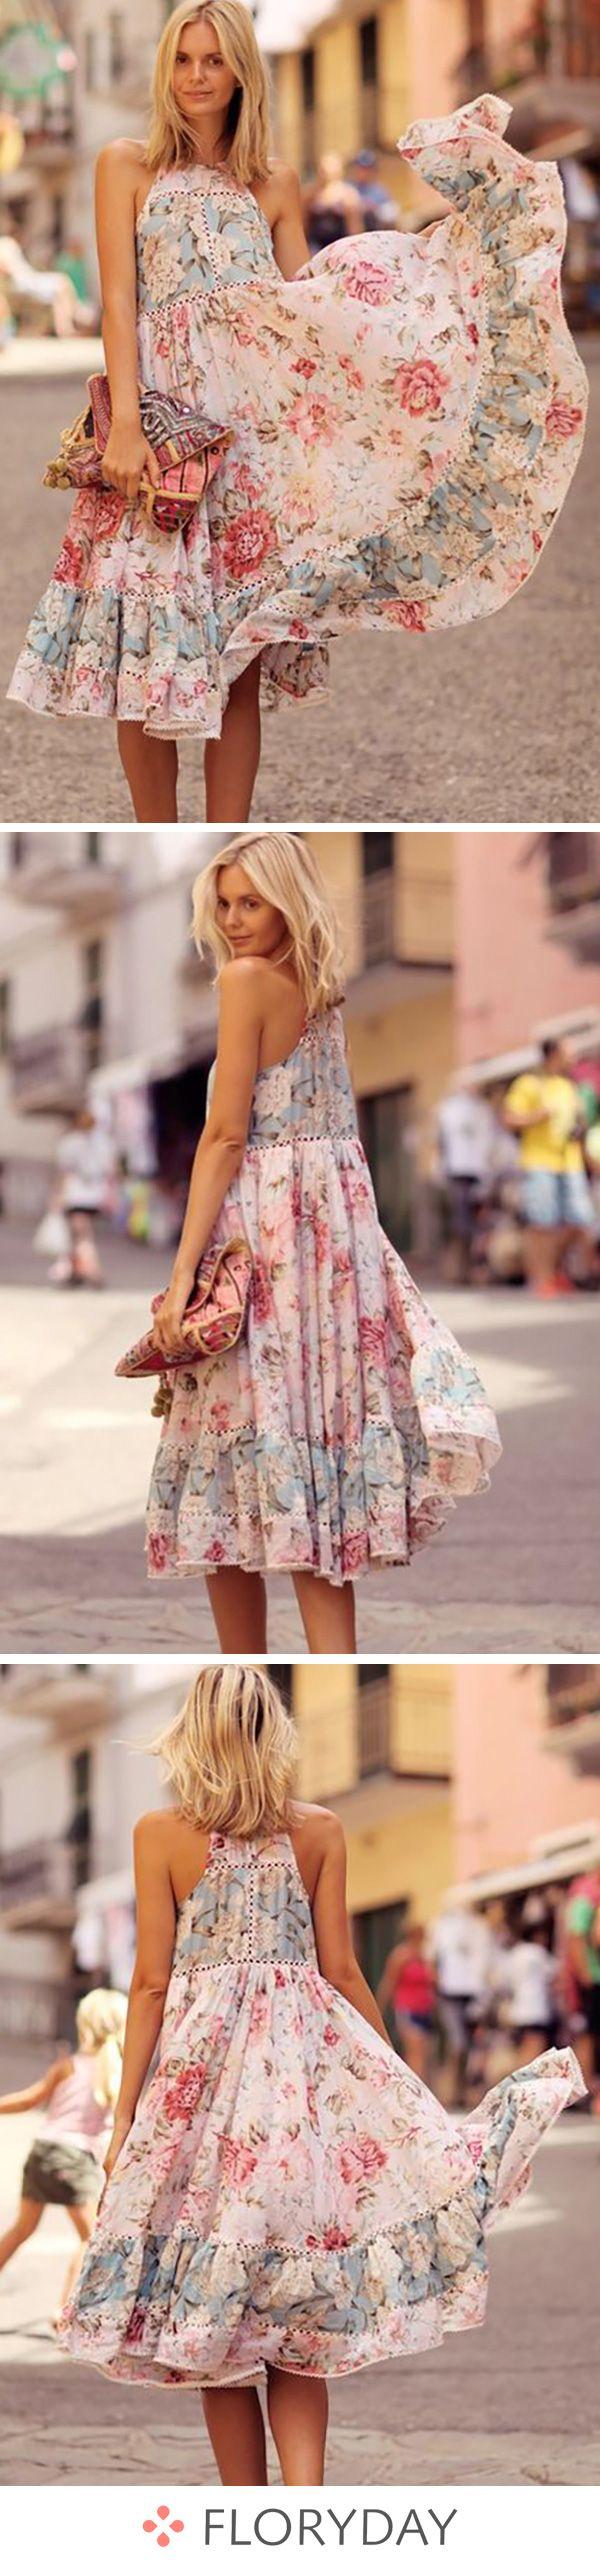 Floral Ruffles Skater Midi A-line Dress, floral dress, beautiful dresses, airy-feel dress, SS18